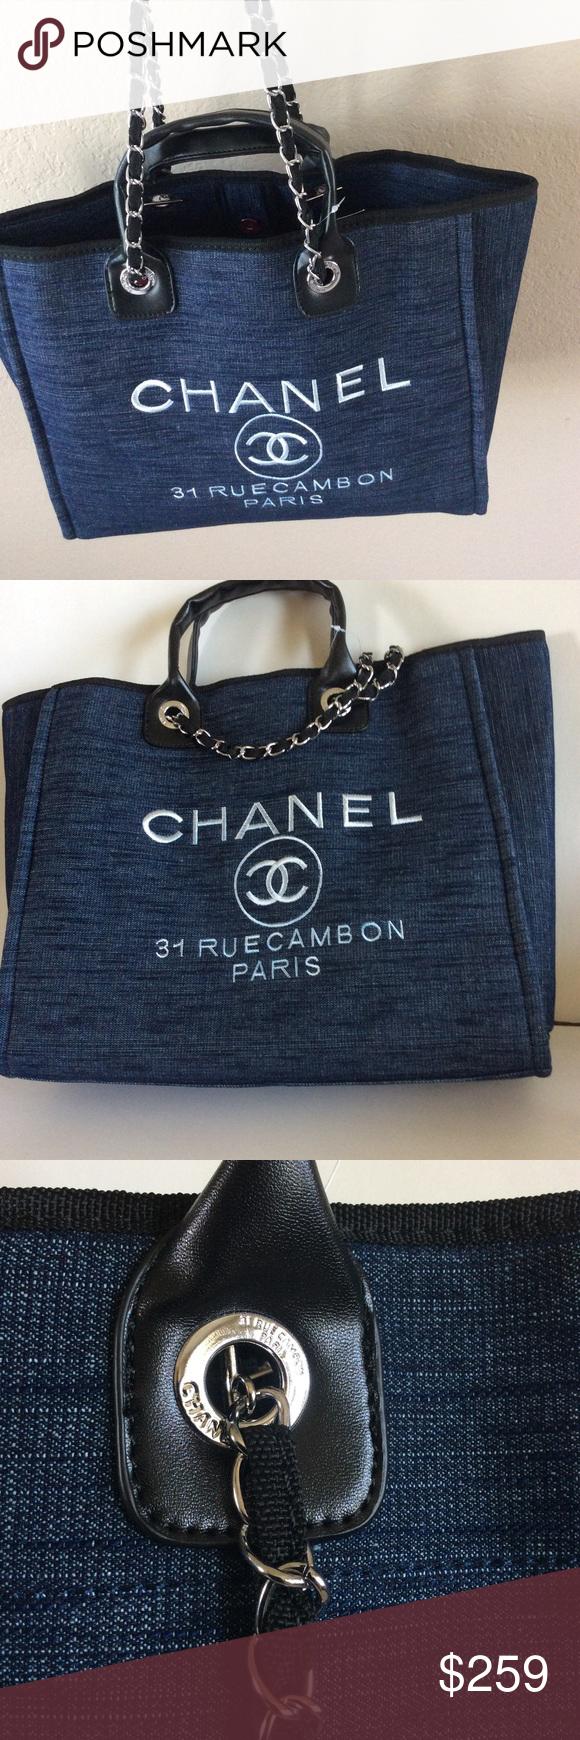 fa4e5c225e66 Make an offer🔥 Chanel VIP Gift Canvas Tote Brand new. Beautiful VIP gift  Canvas